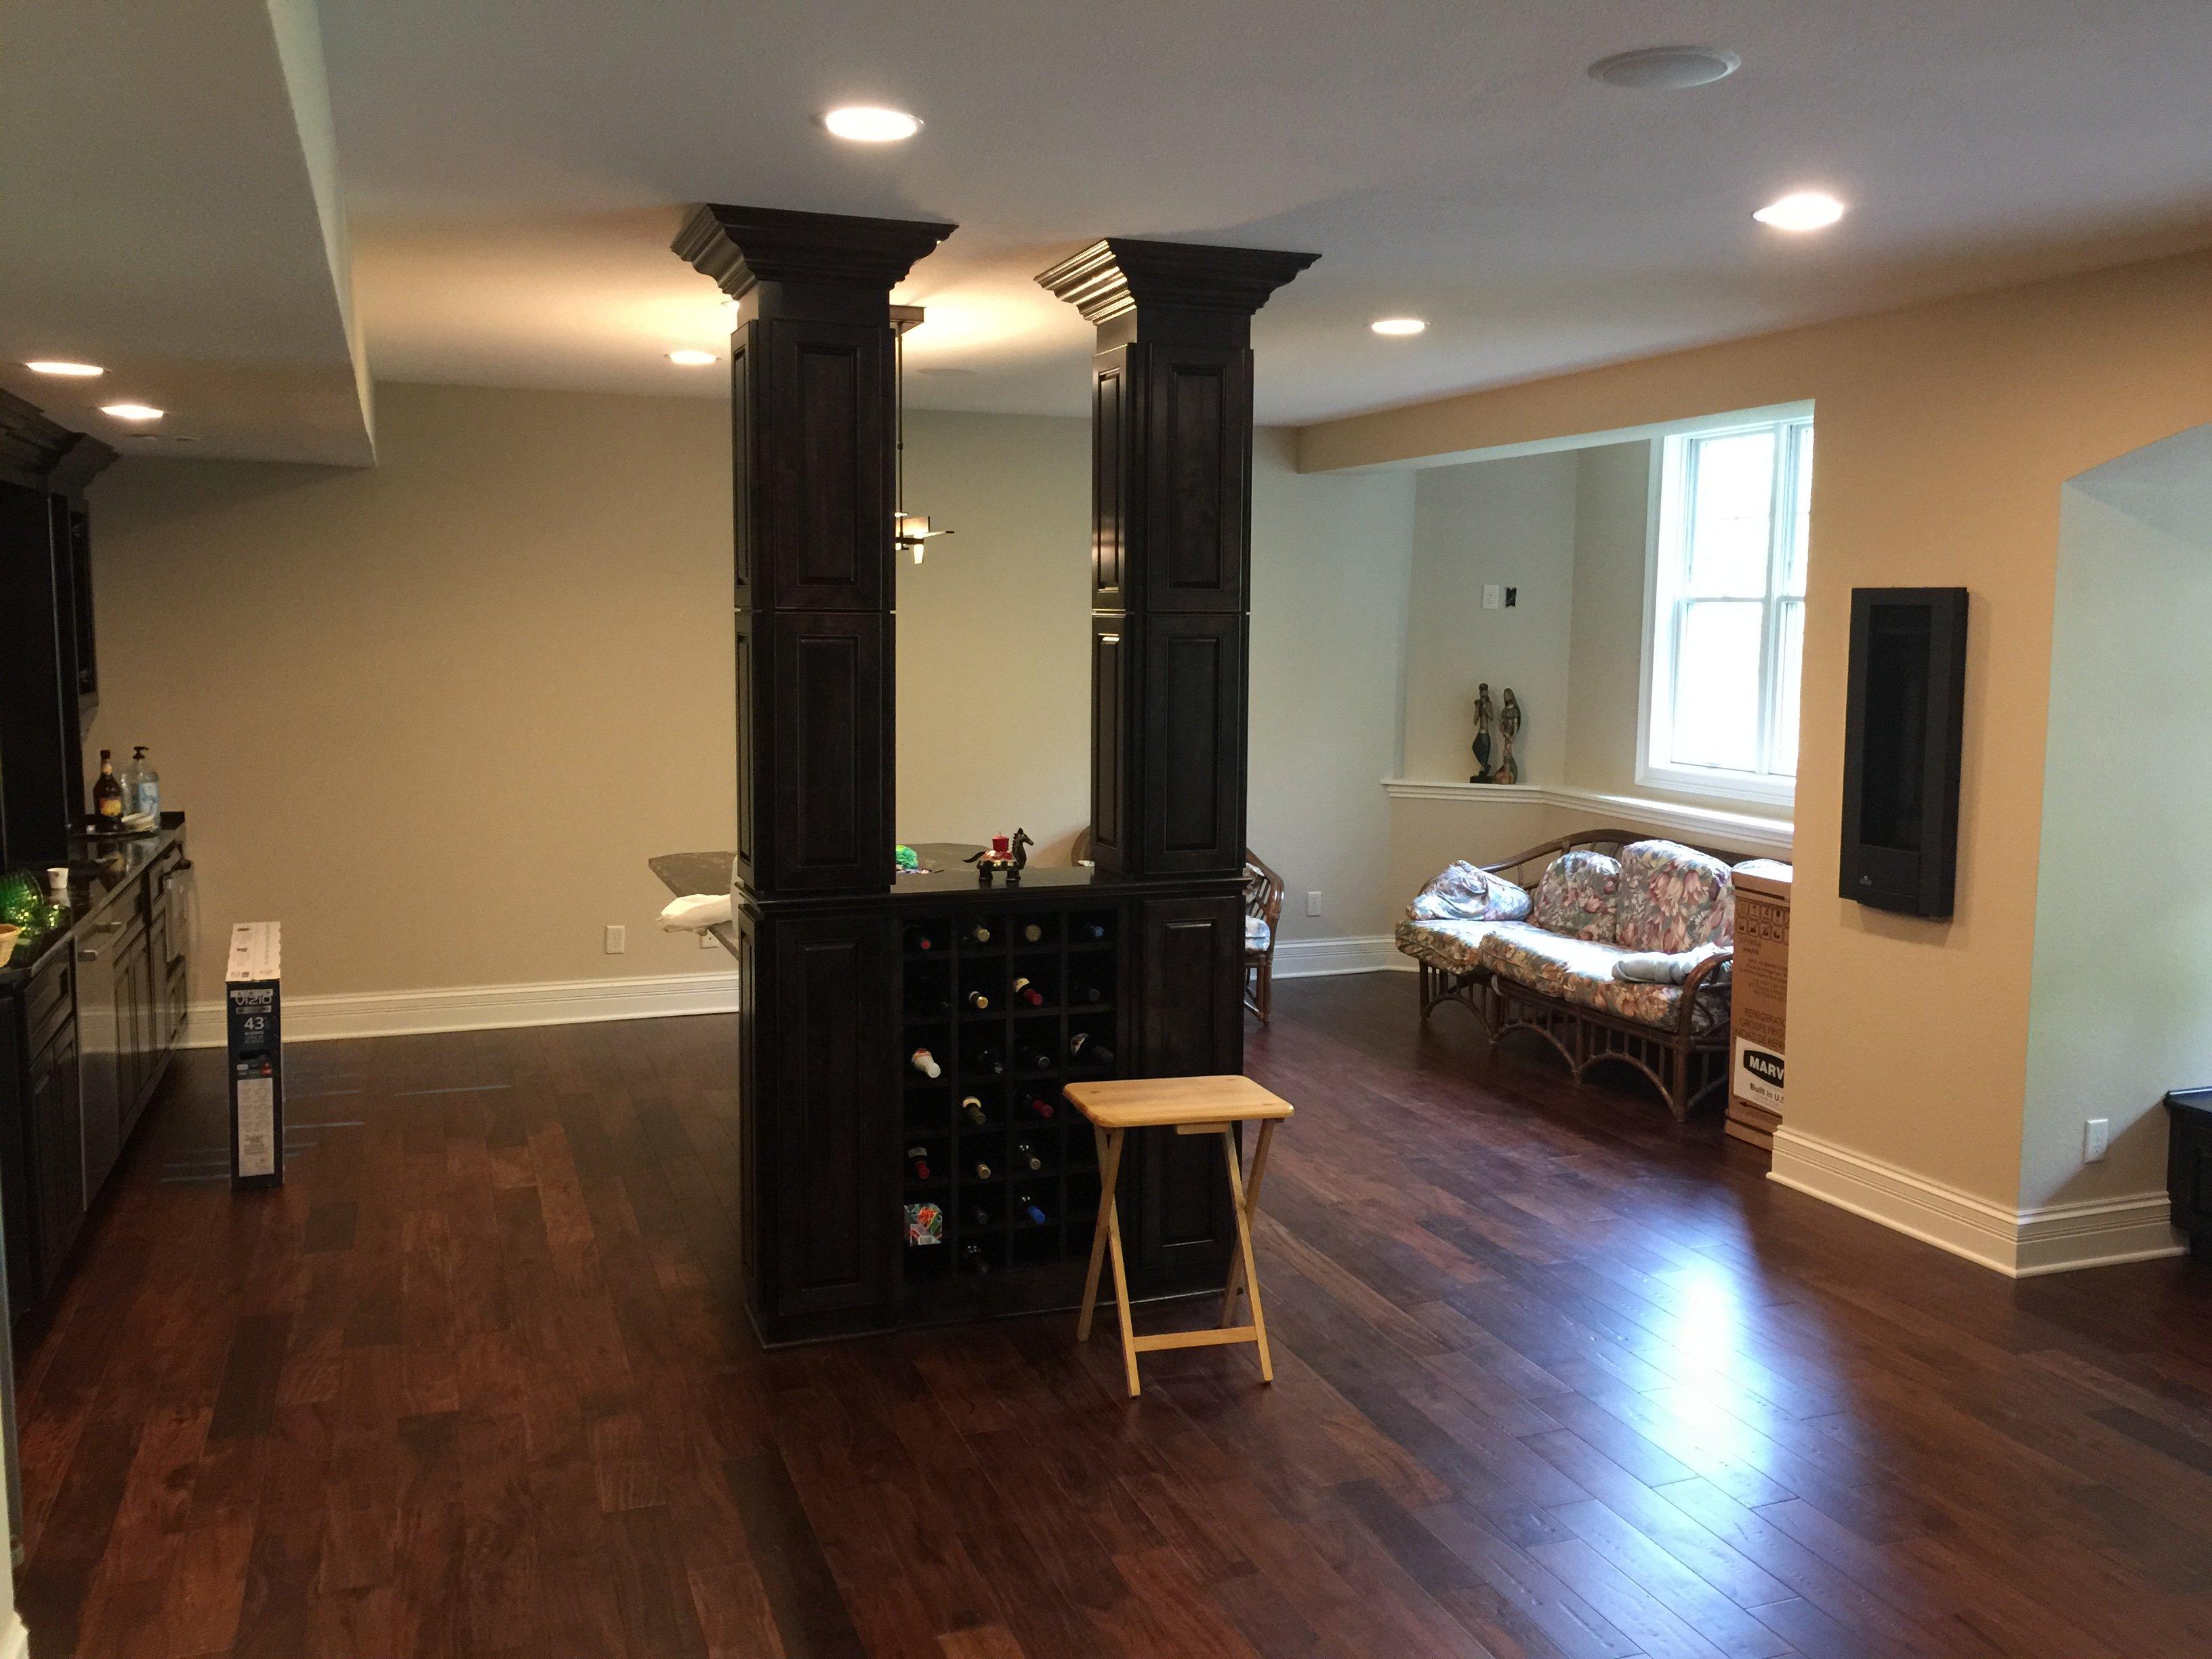 chawla-basement-remodel (3)